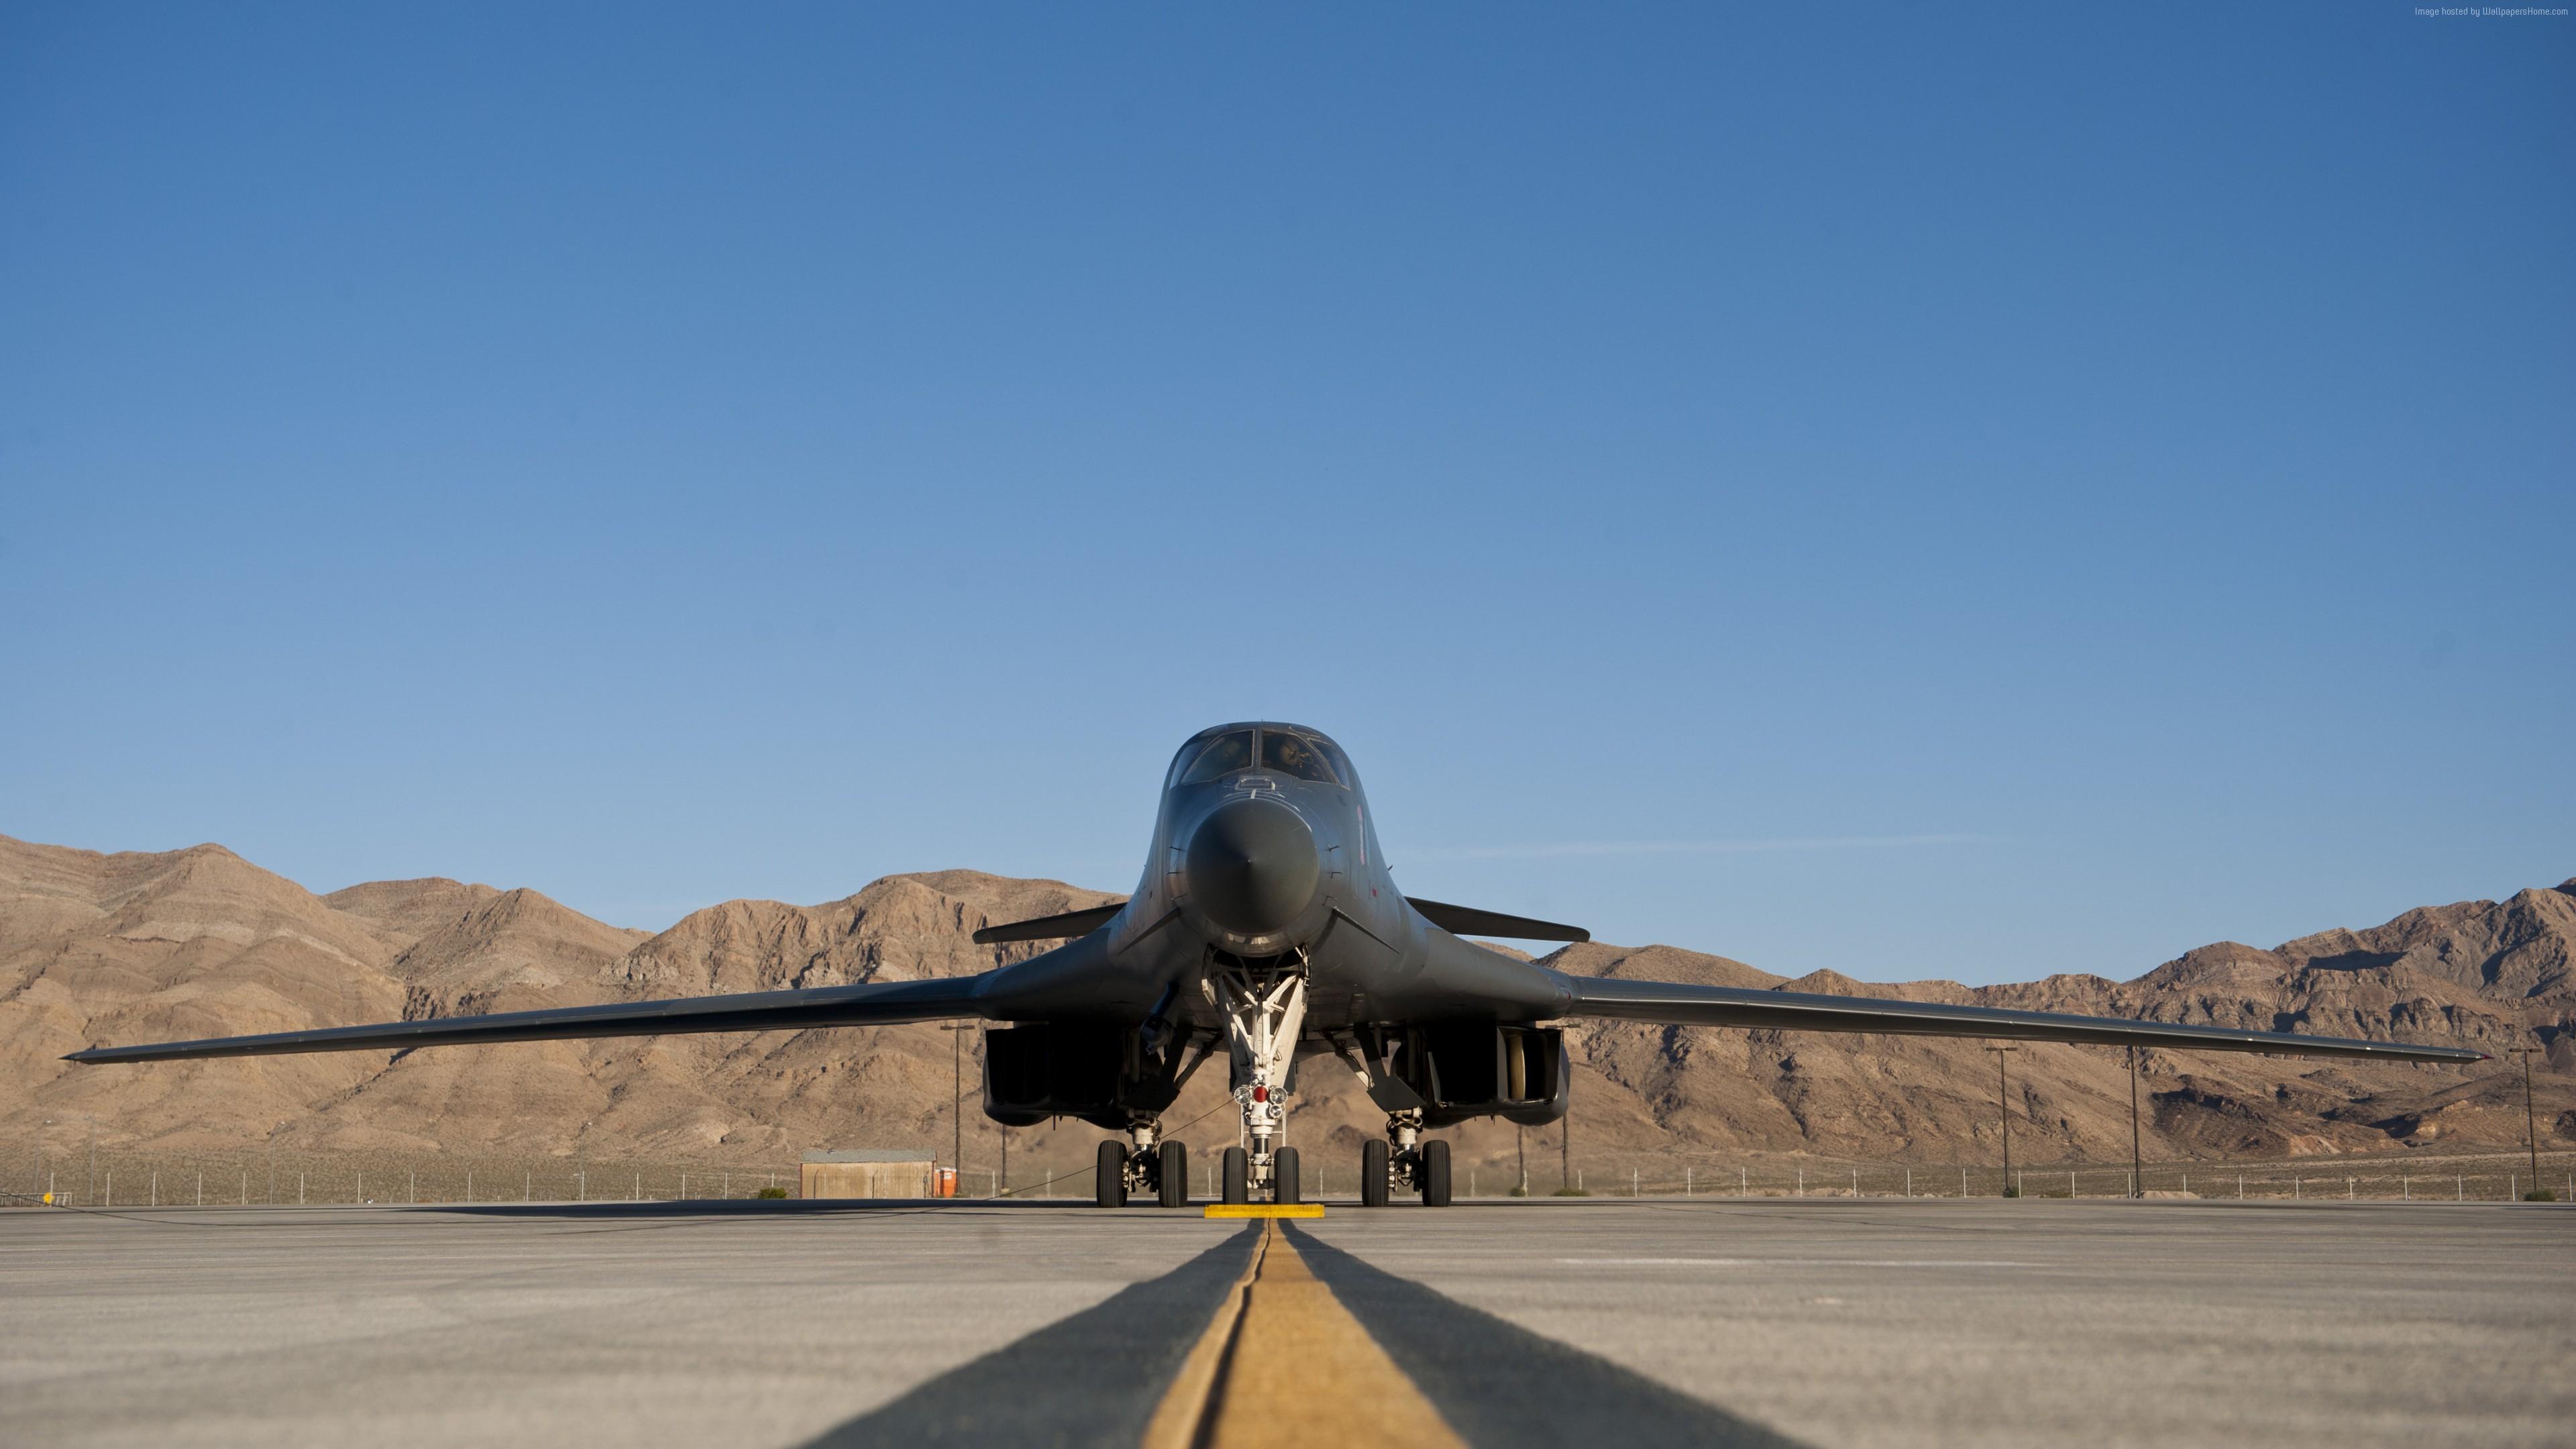 wallpaper rockwell b-1 lancerr, fighter aircraft, u.s. air force